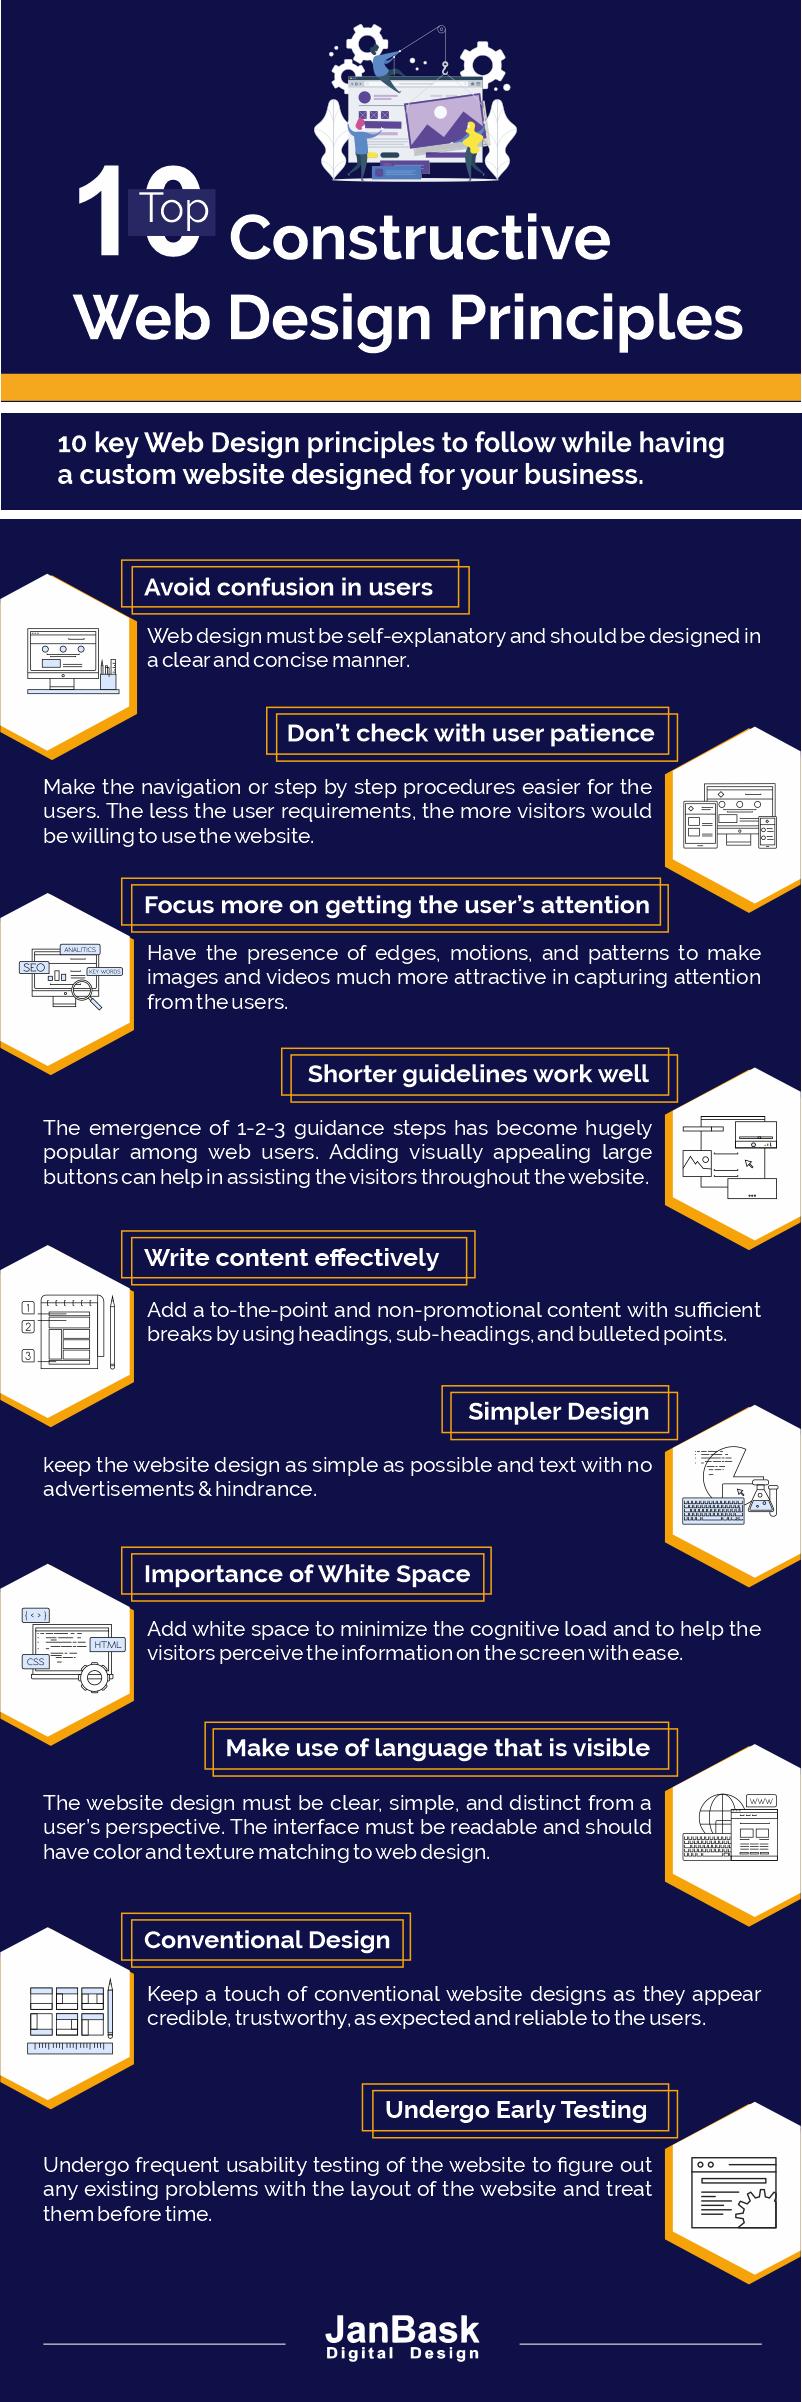 Top 10 Constructive Web Design Principles Janbask Digital Design Blog